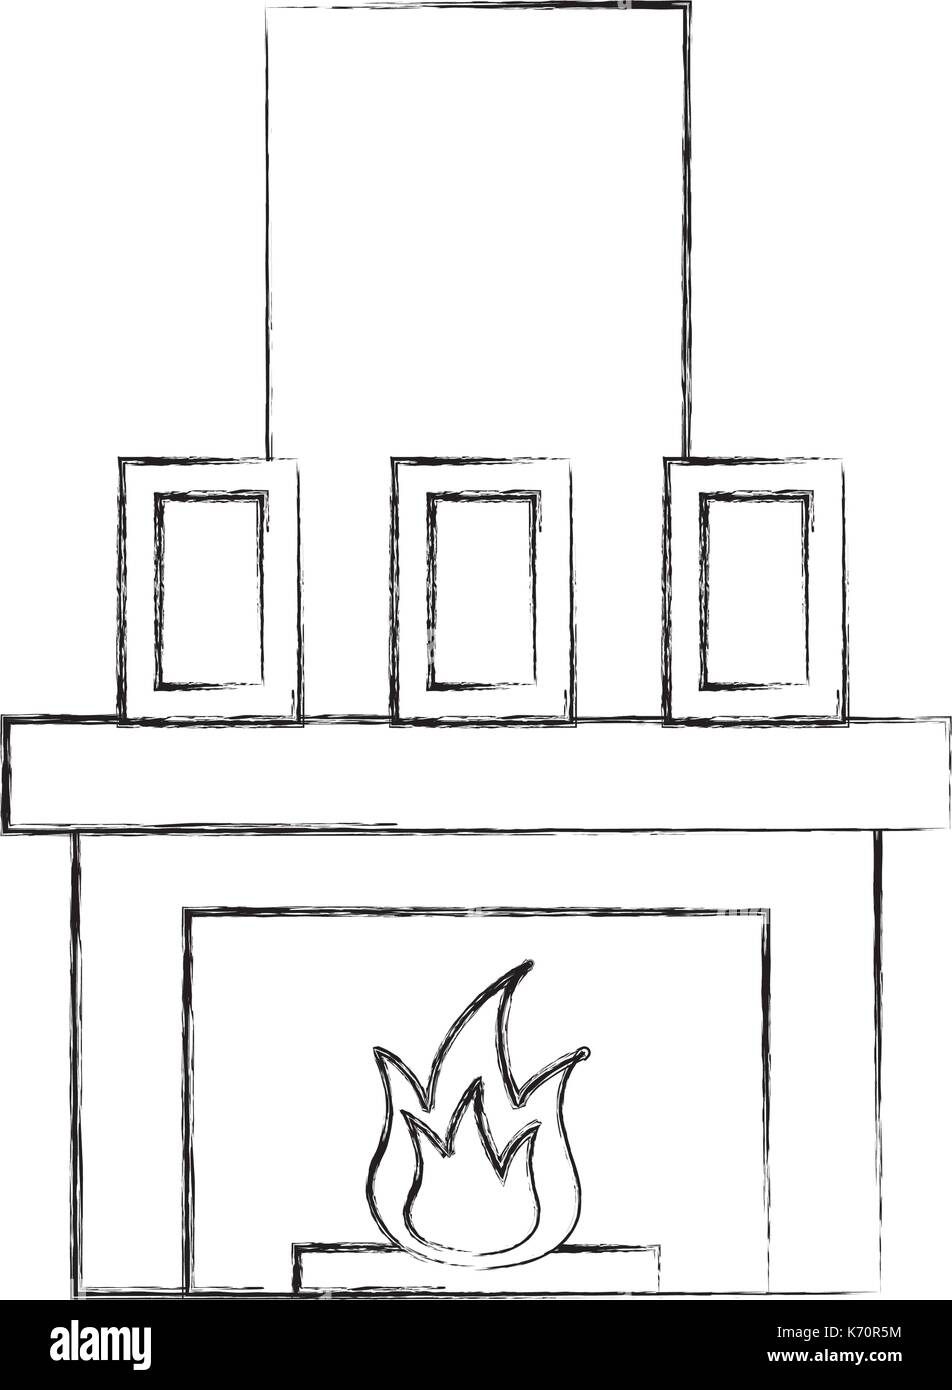 medium resolution of fireplace chimney flame indoor decoration